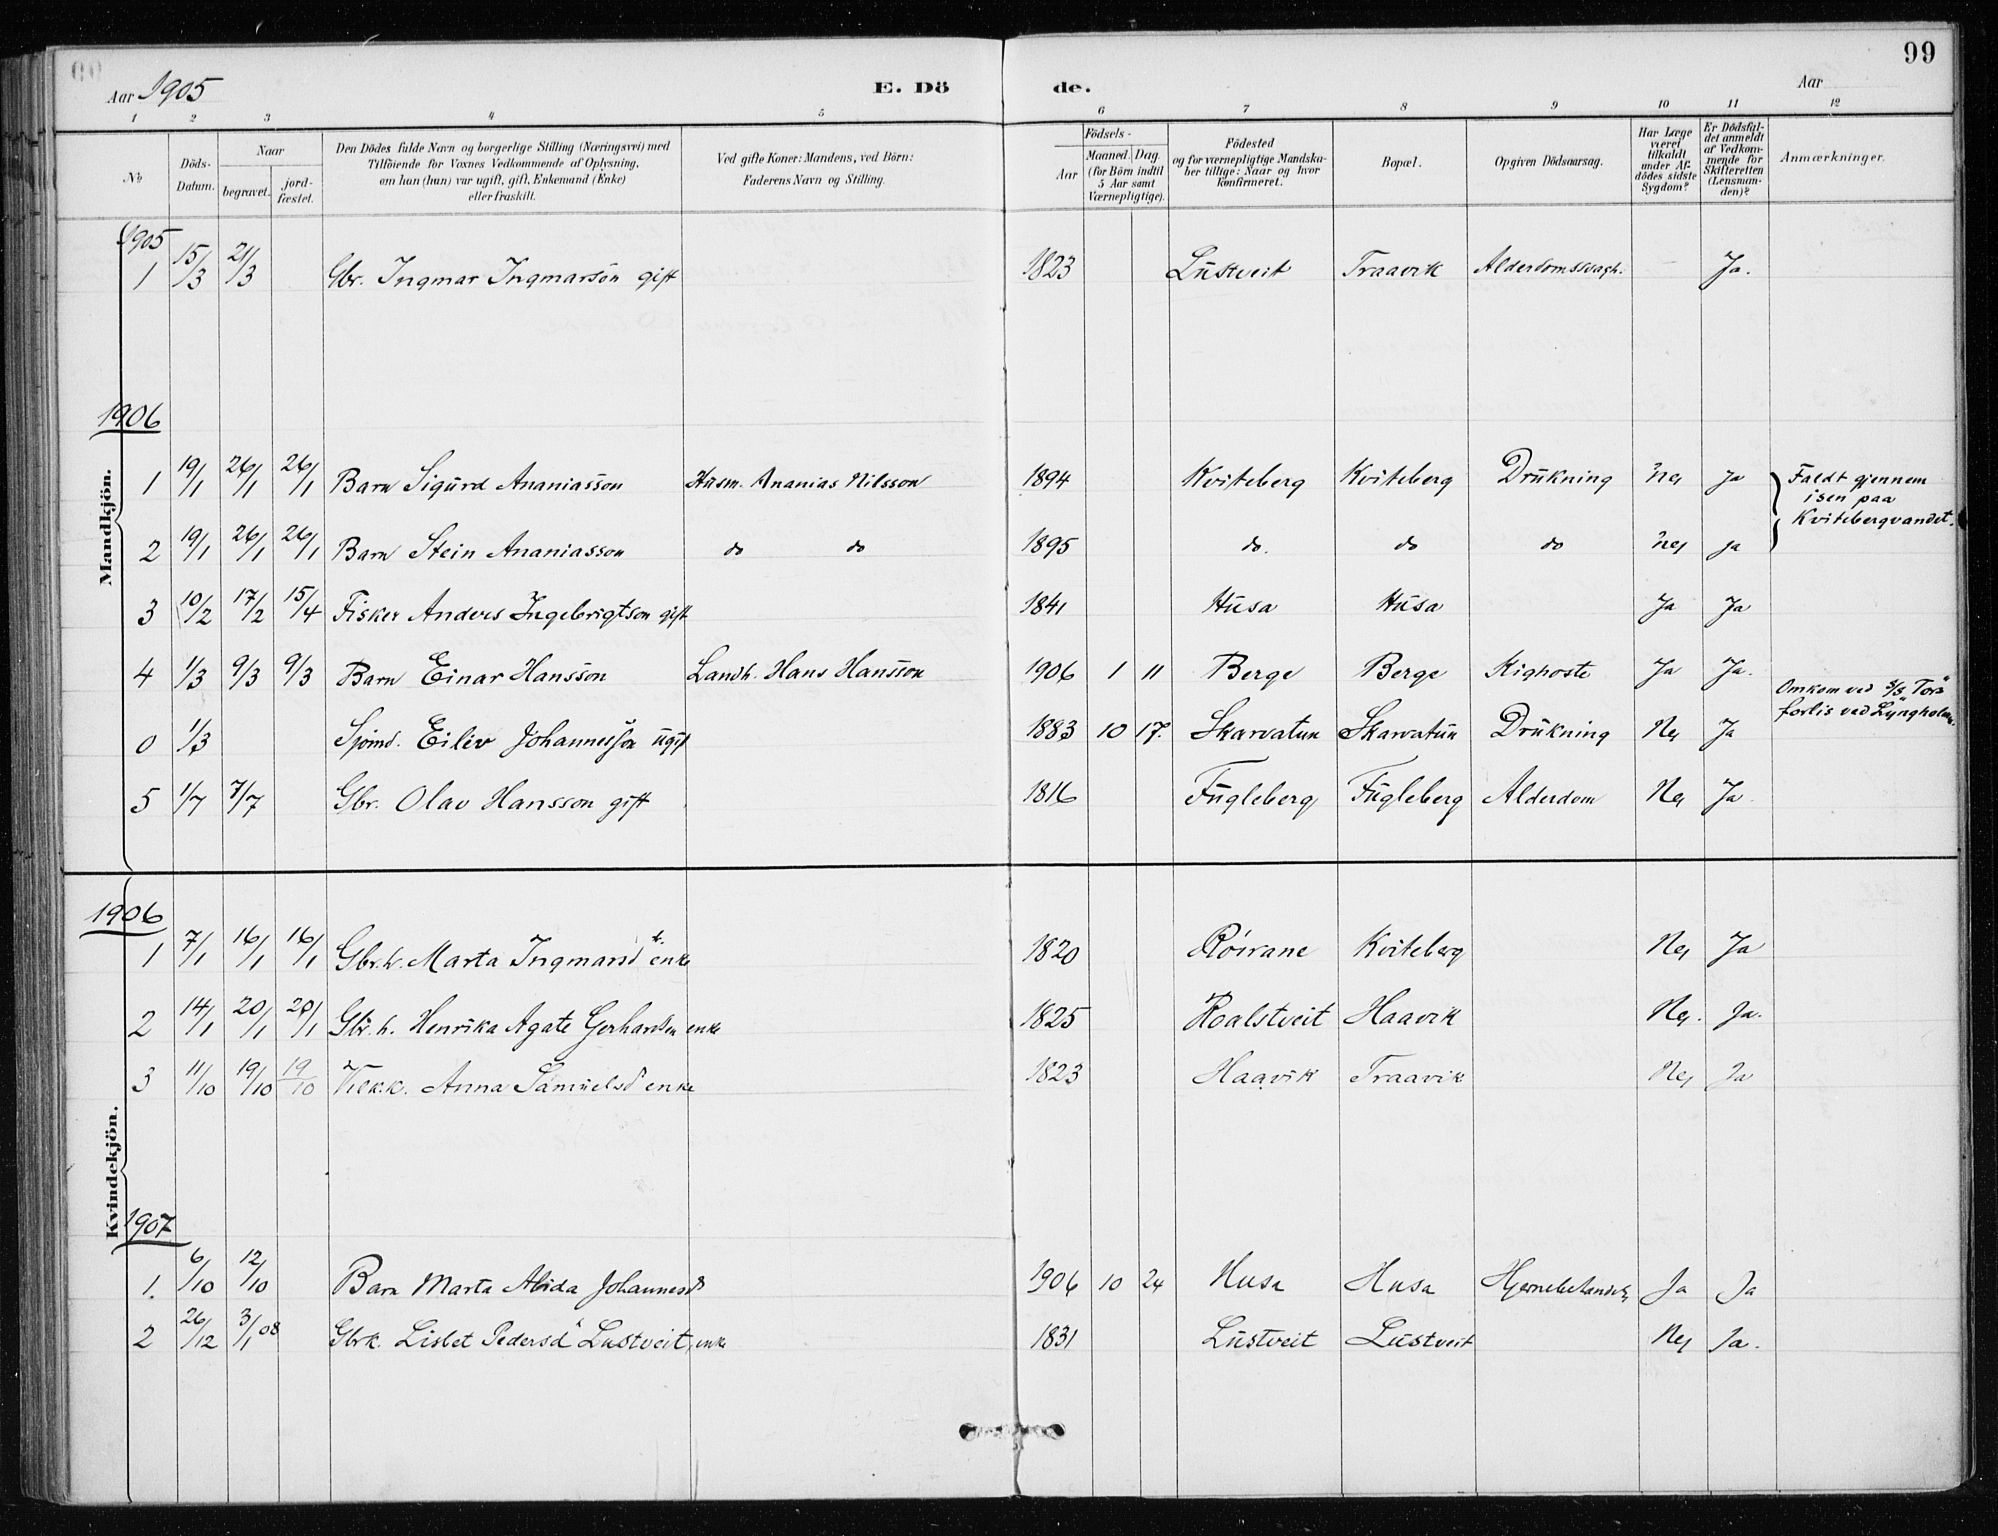 SAB, Kvinnherad Sokneprestembete, H/Haa: Ministerialbok nr. E 1, 1887-1912, s. 99